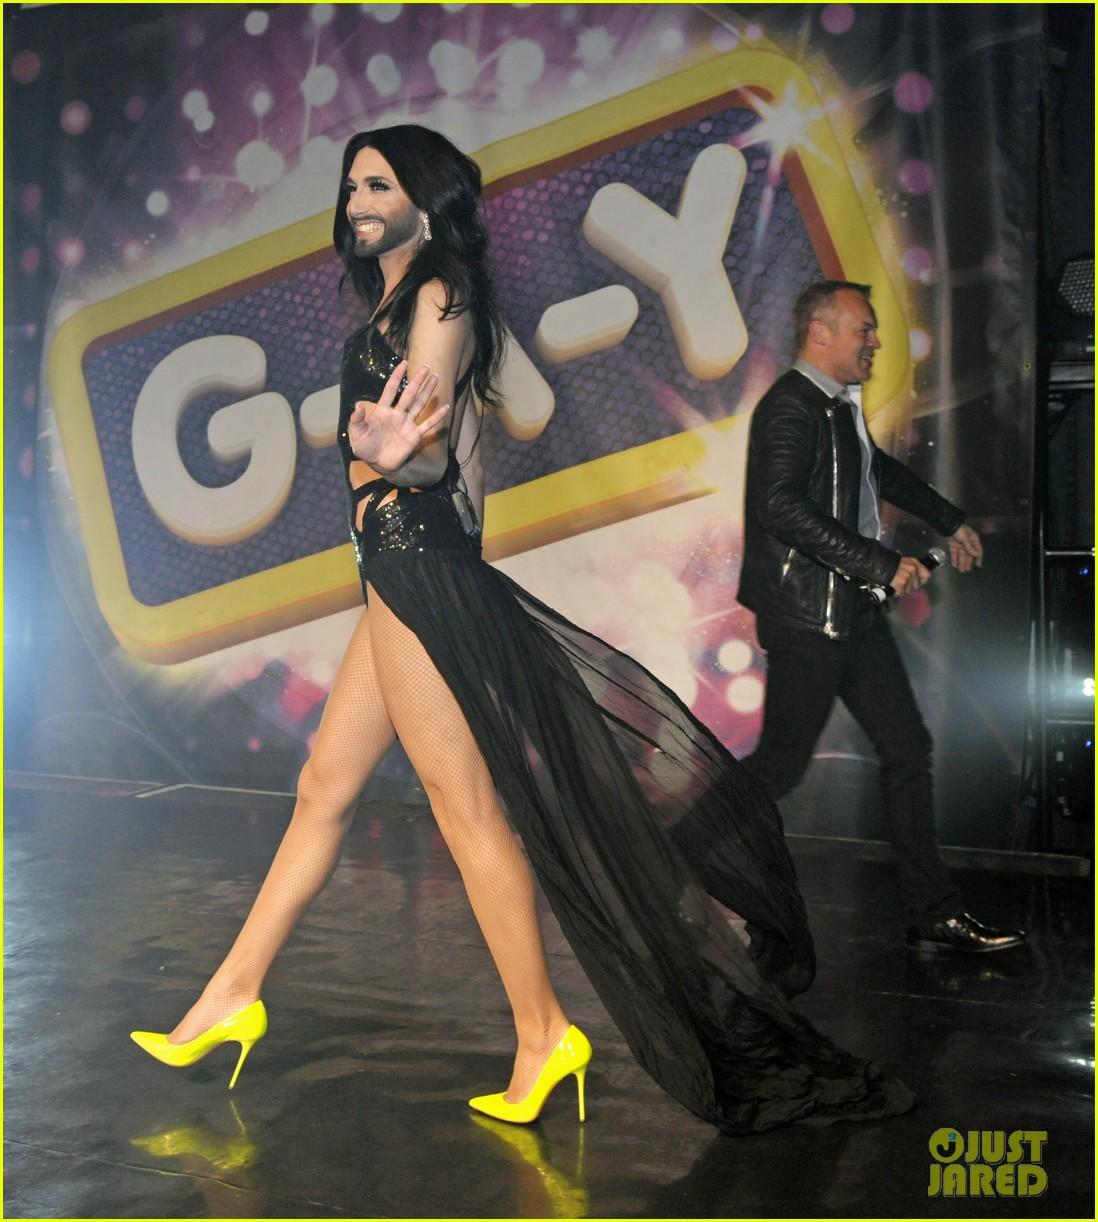 conchita wurst shoots down lady gaga tour rumors 03